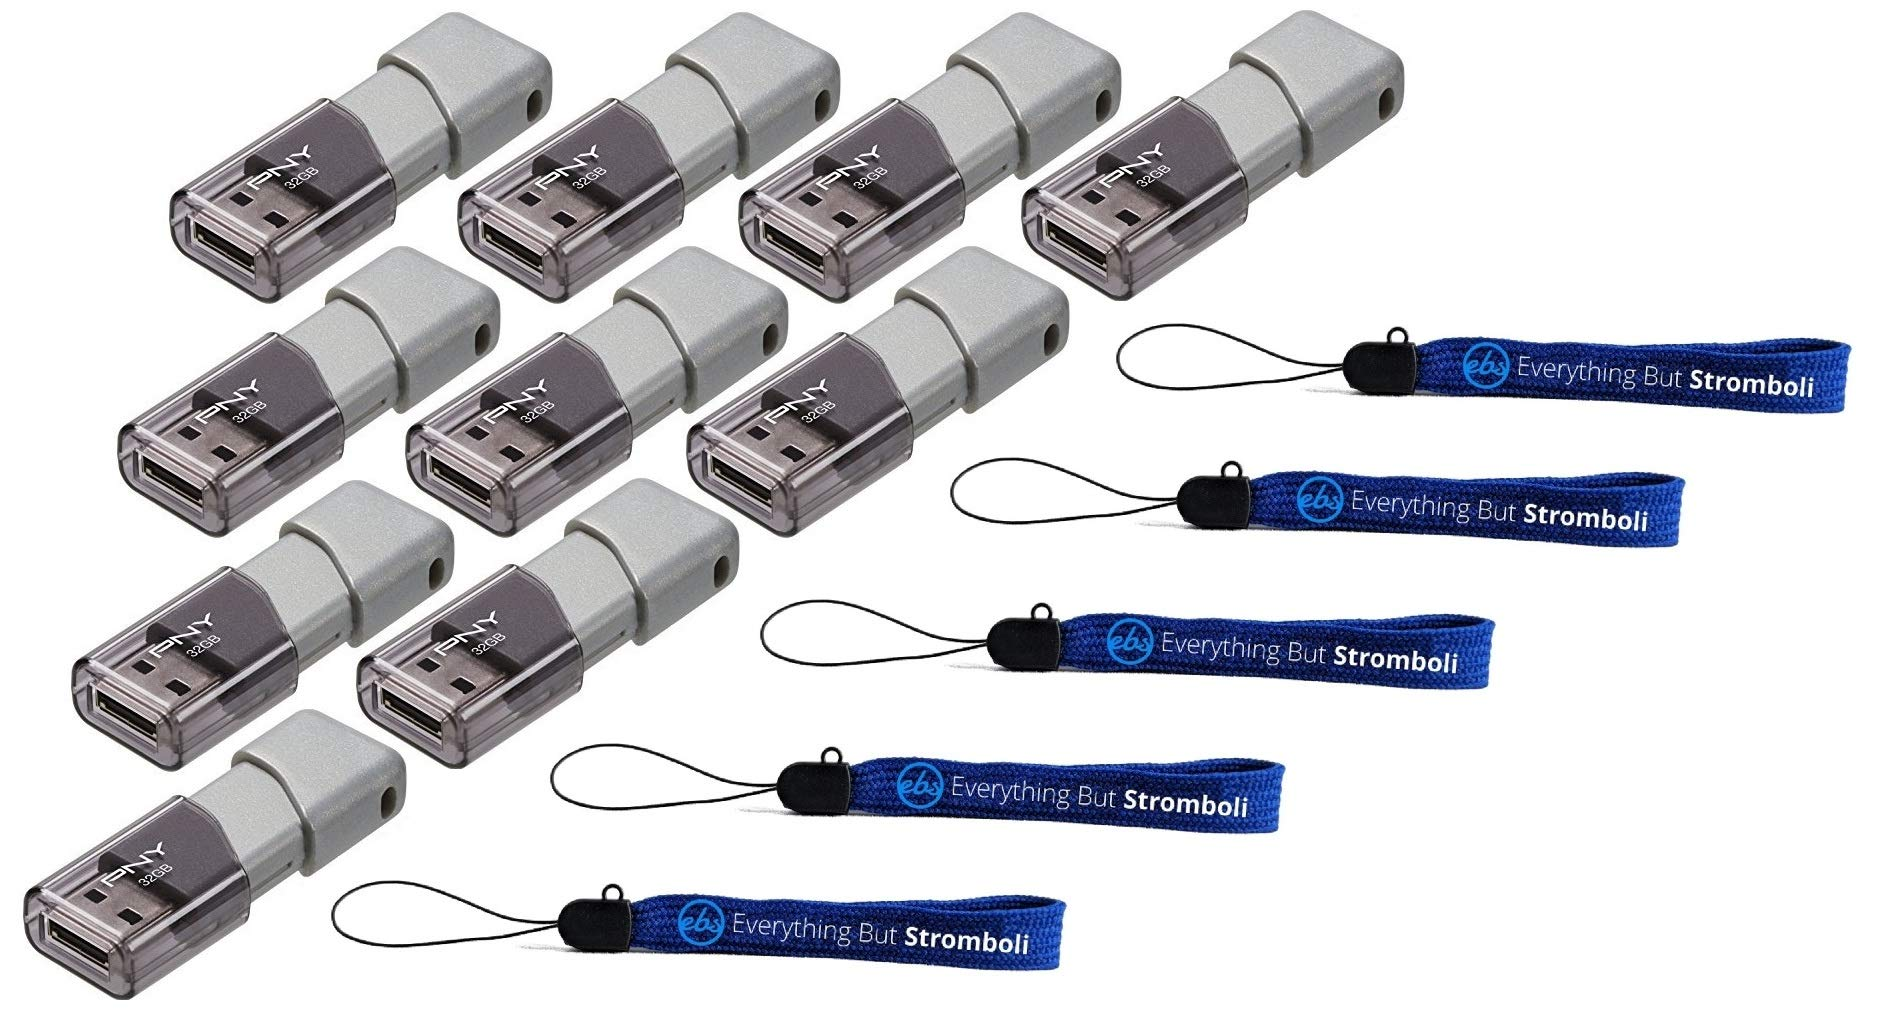 PNY 32GB USB 3.0 Flash Drive Elite Turbo Attache 3 (Ten Pack Bundle) Plus (5) Everything But Stromboli (TM) Lanyard (P-FD32GTBOP-GE)